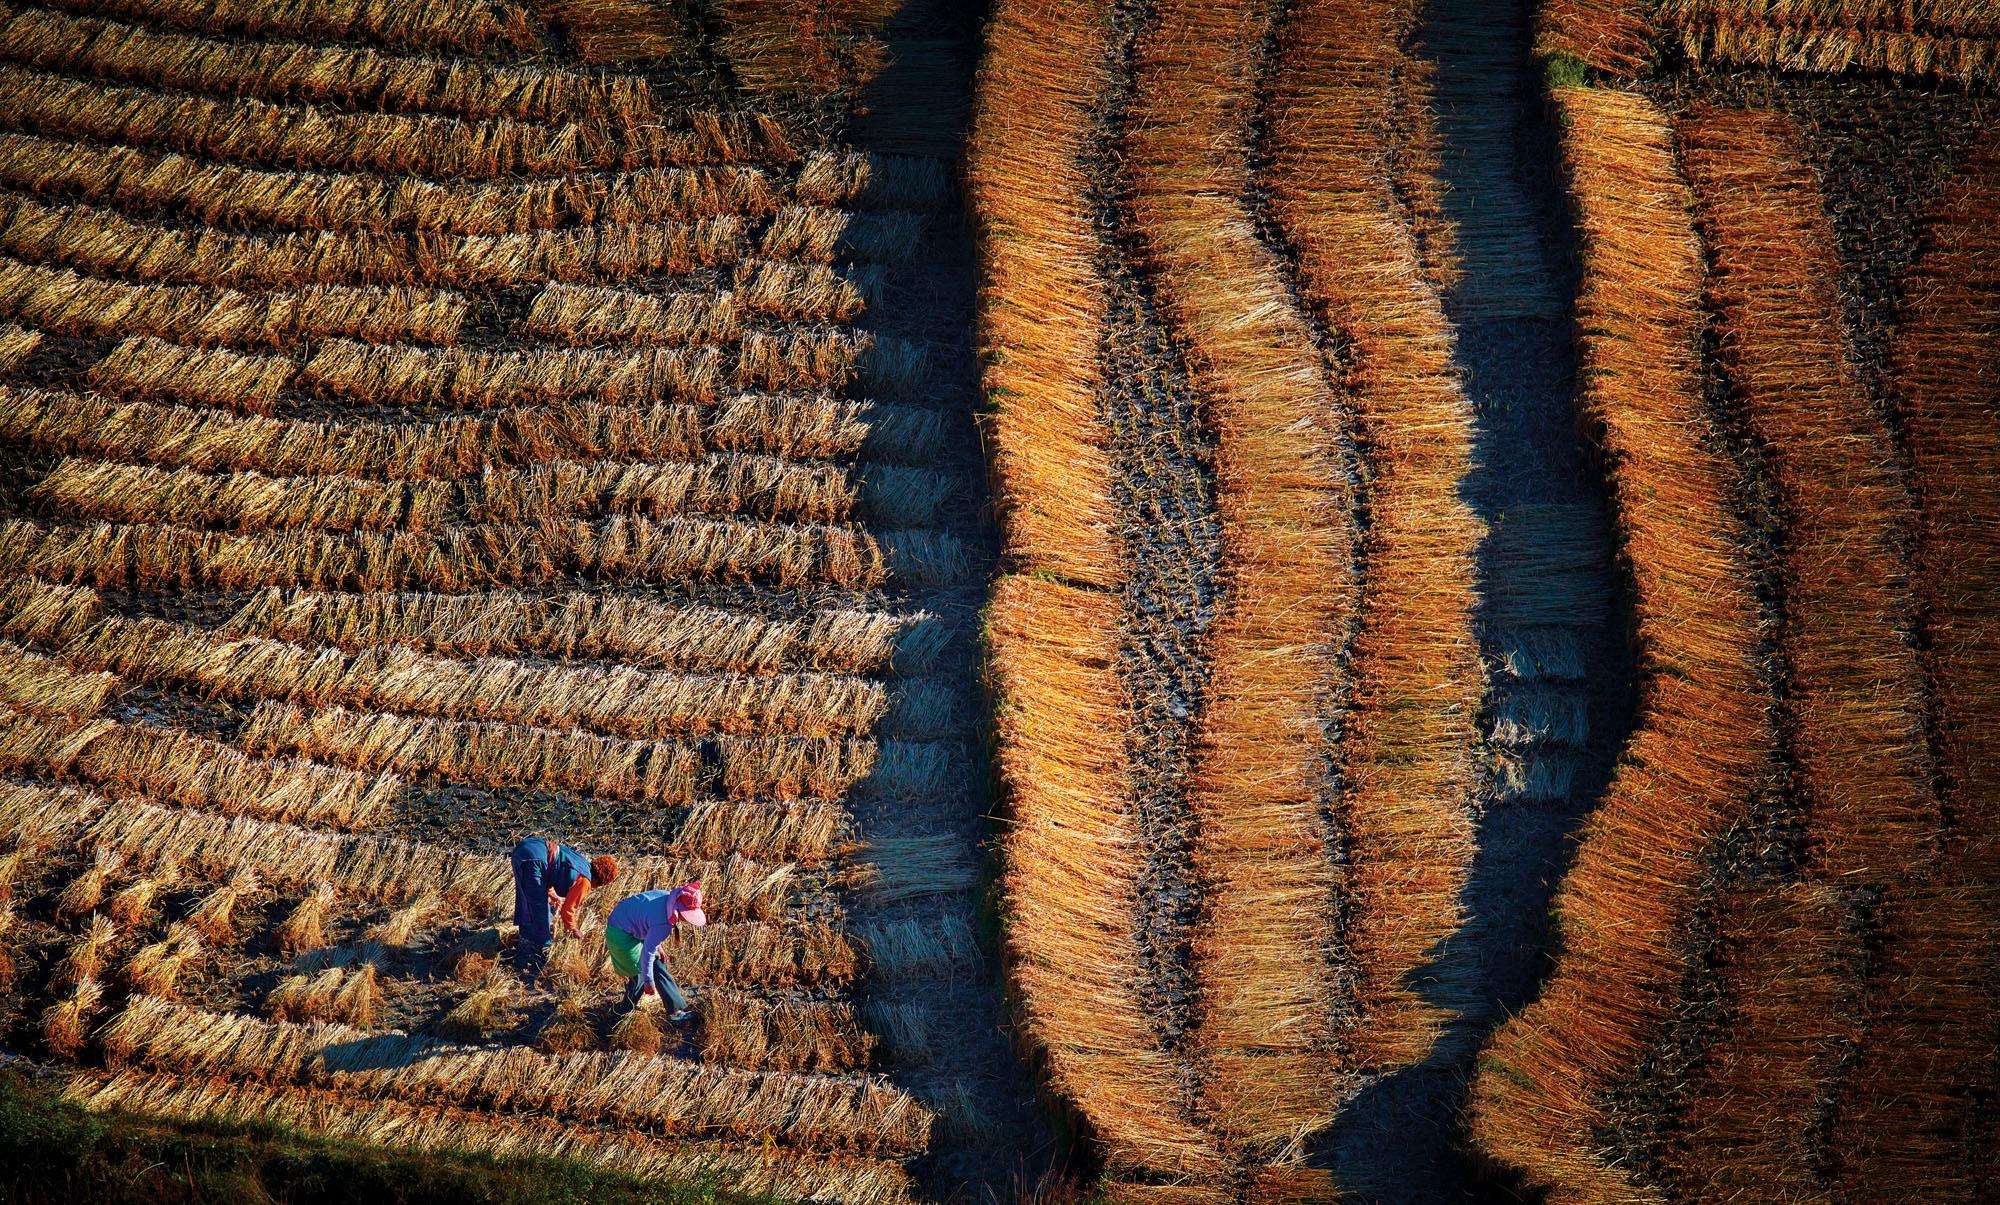 Harvest time, near Paro, Bhutan. Taken on a photo tour. Canon EOS 5DSR, Canon 300mm f2.8 USM, f5.6 @ 1/250 second, ISO 100.